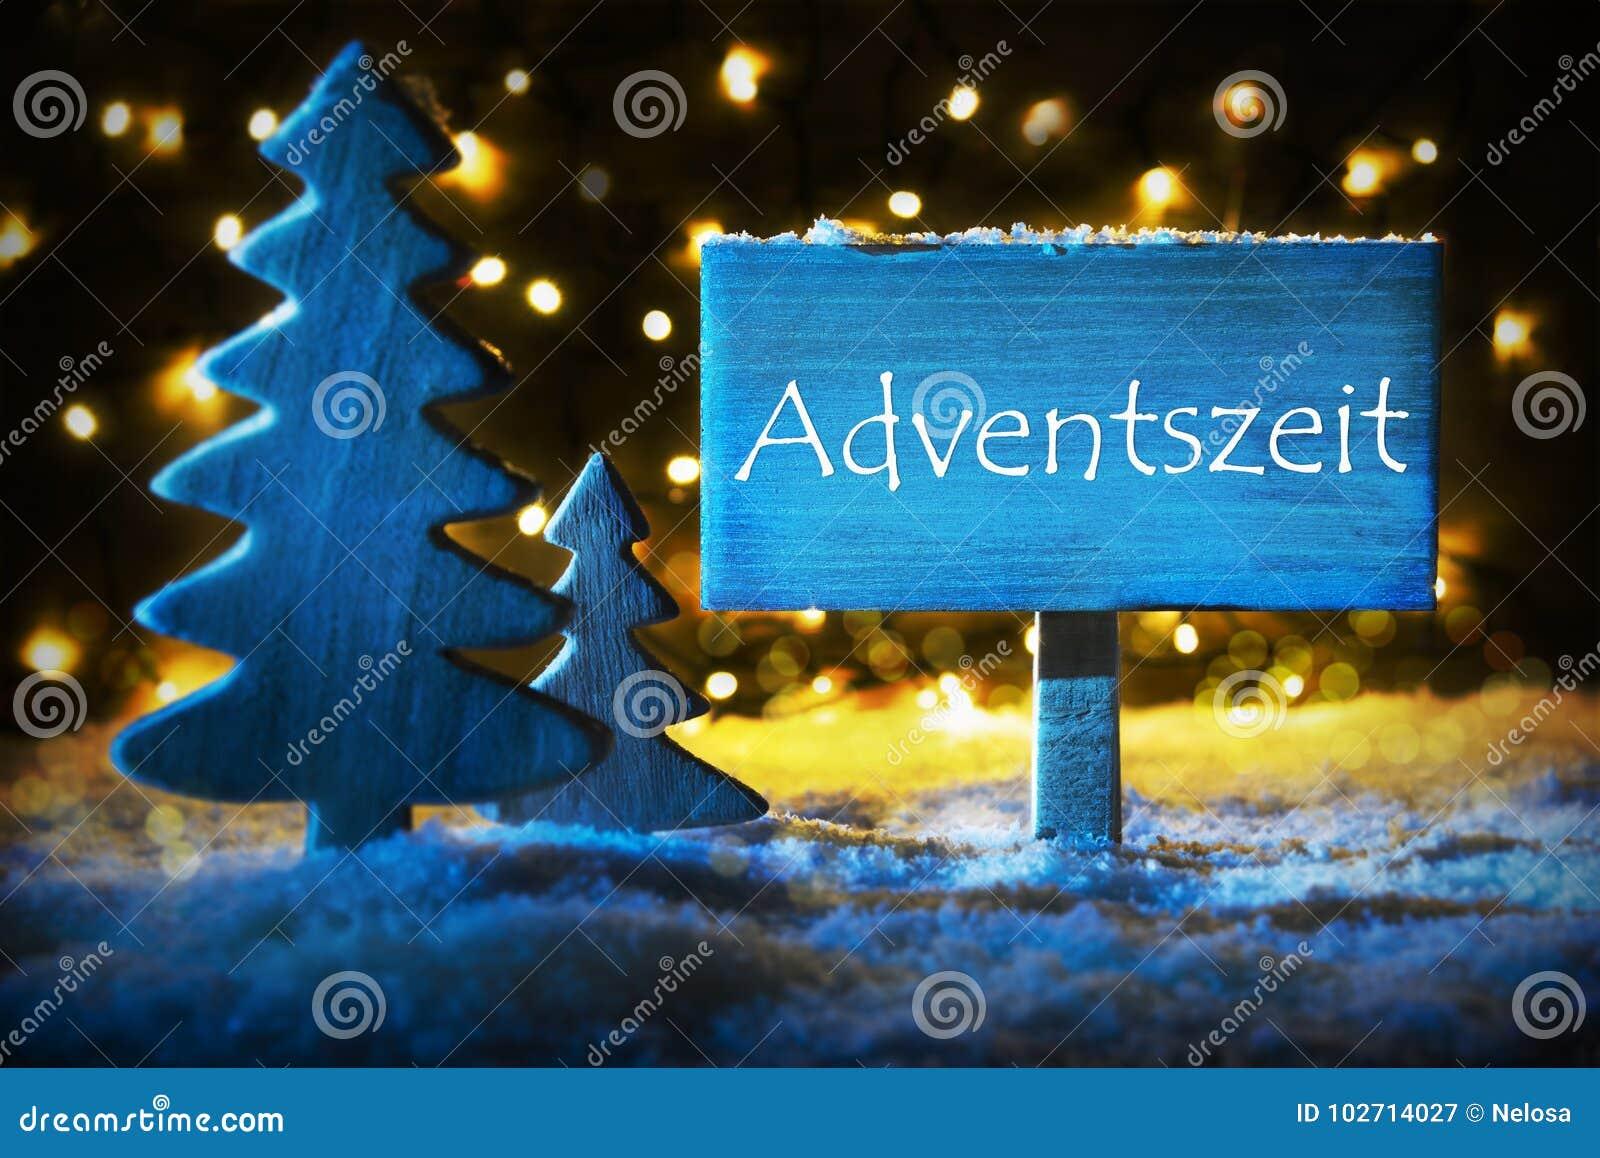 Blue christmas tree adventszeit means advent season stock image blue christmas tree adventszeit means advent season m4hsunfo